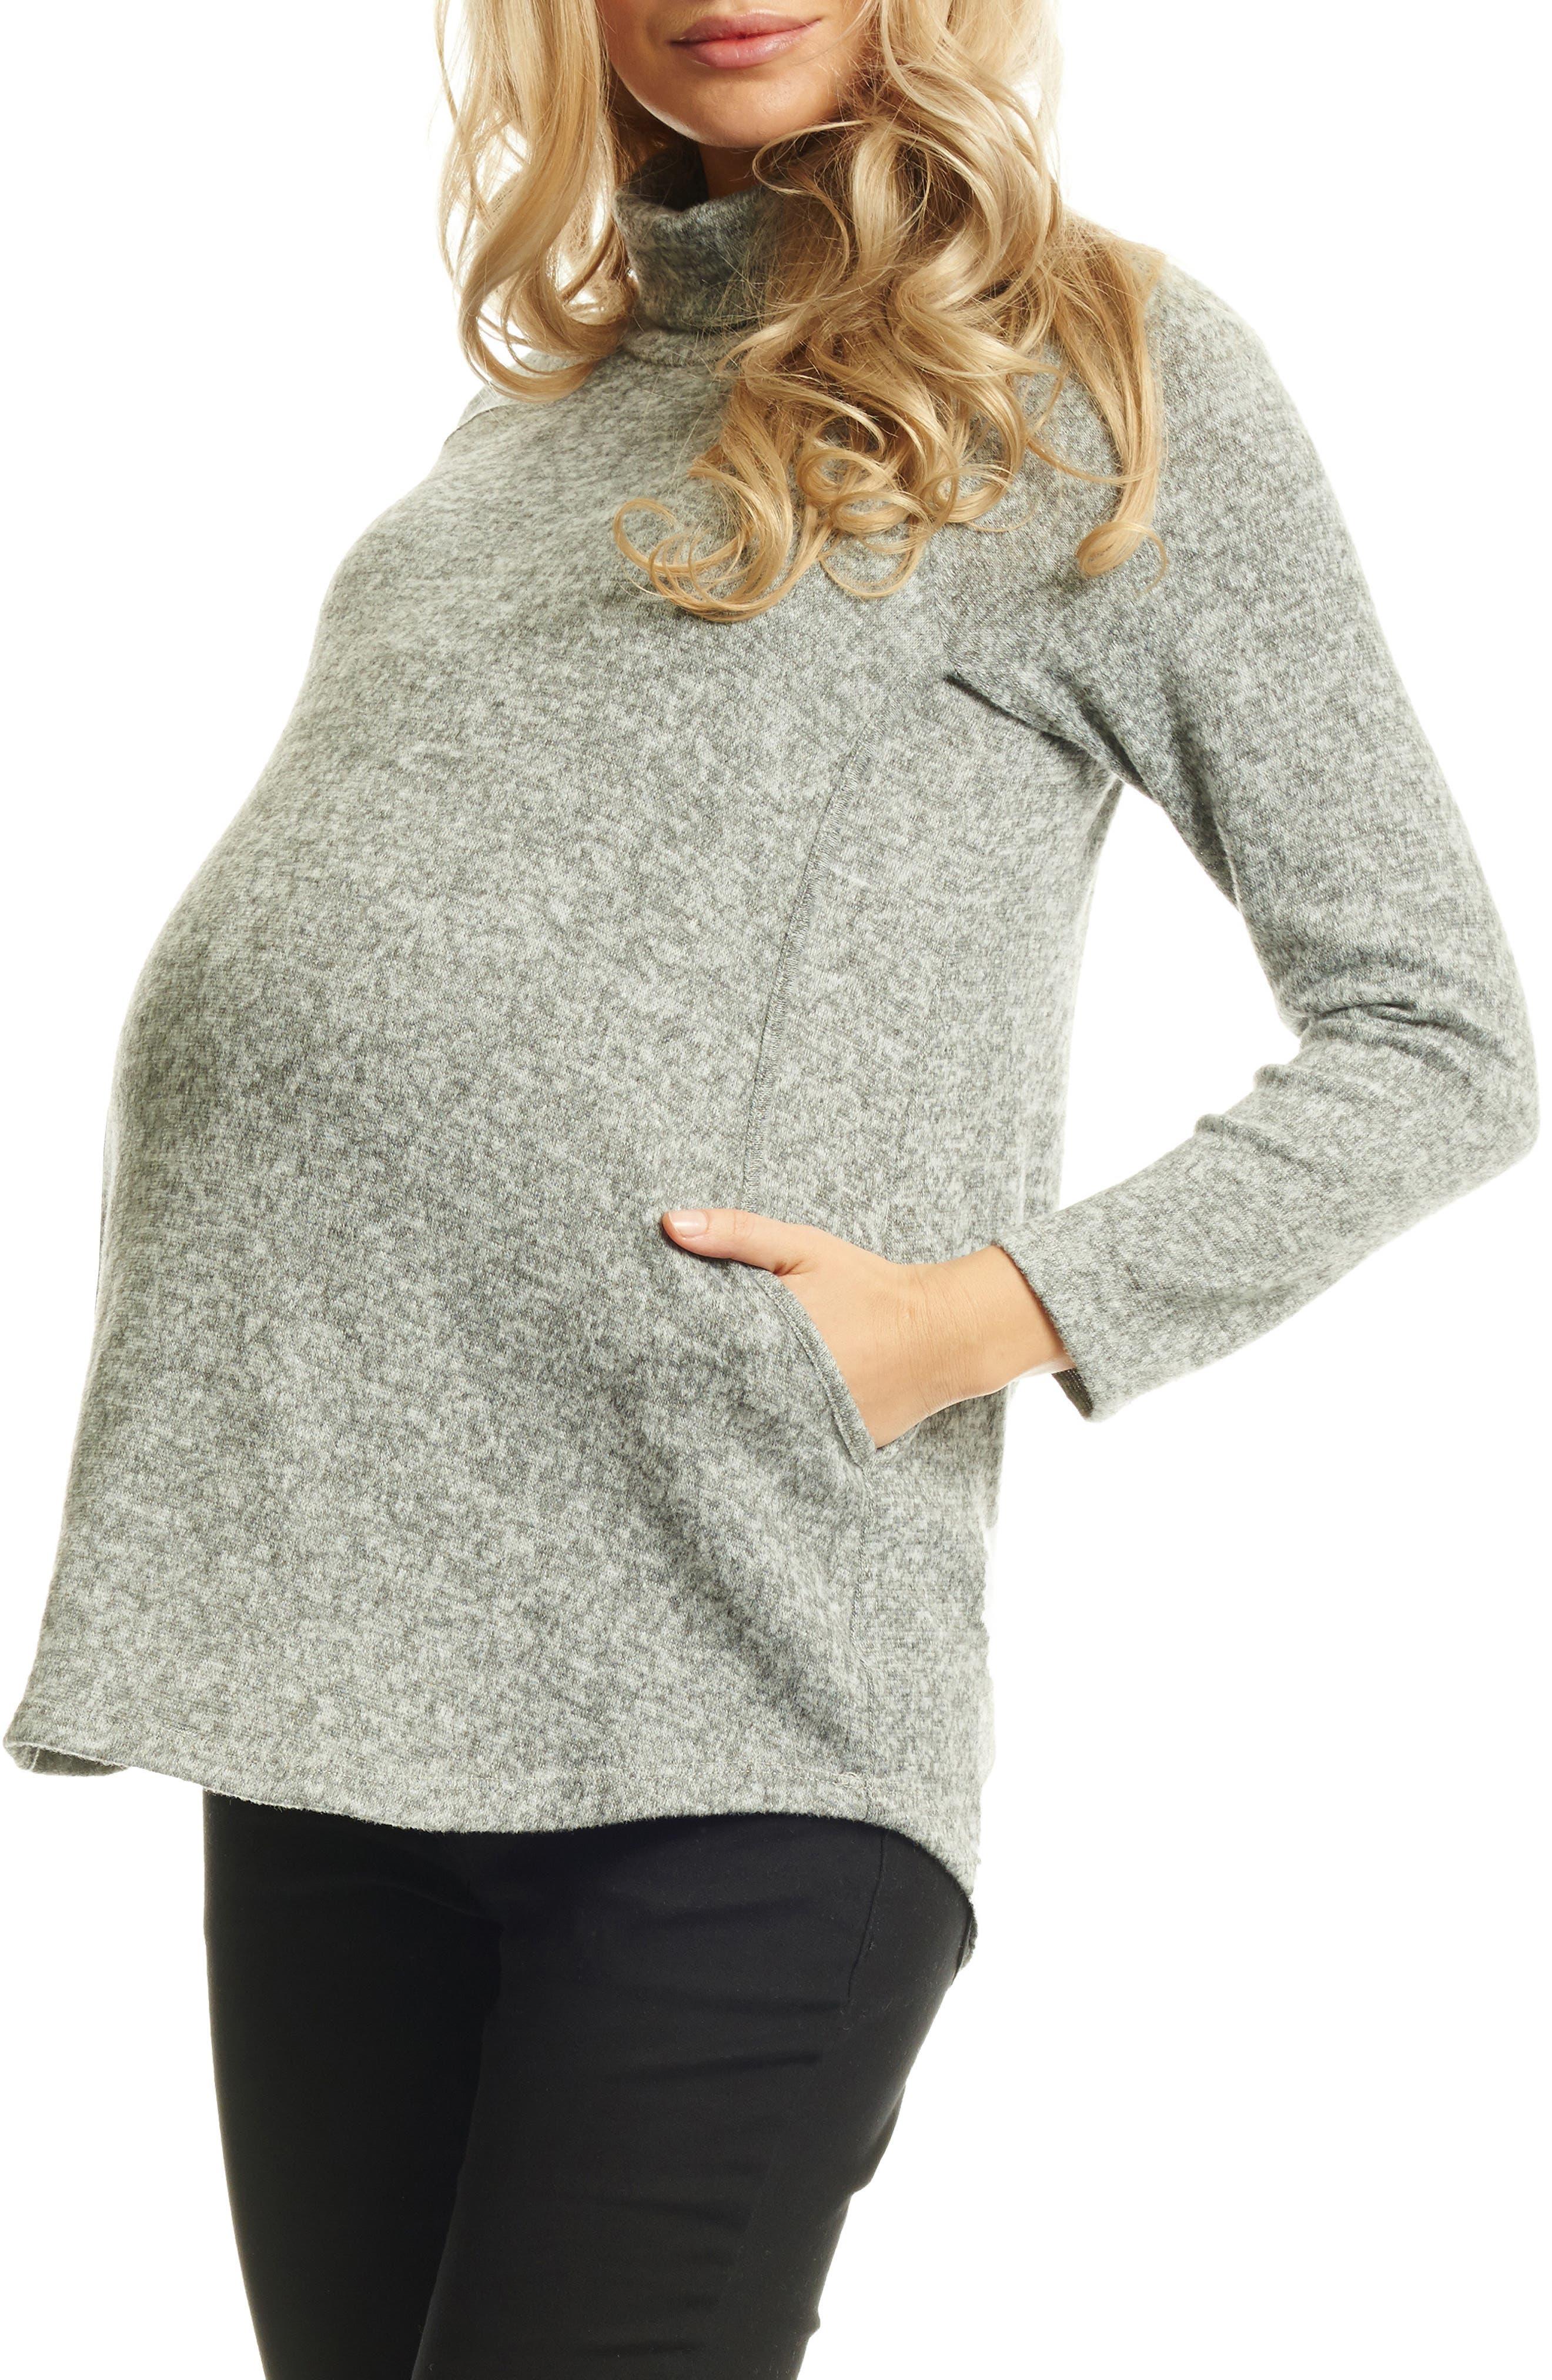 EVERLY GREY Teresa Maternity/Nursing Turtleneck, Main, color, HEATHER GREY